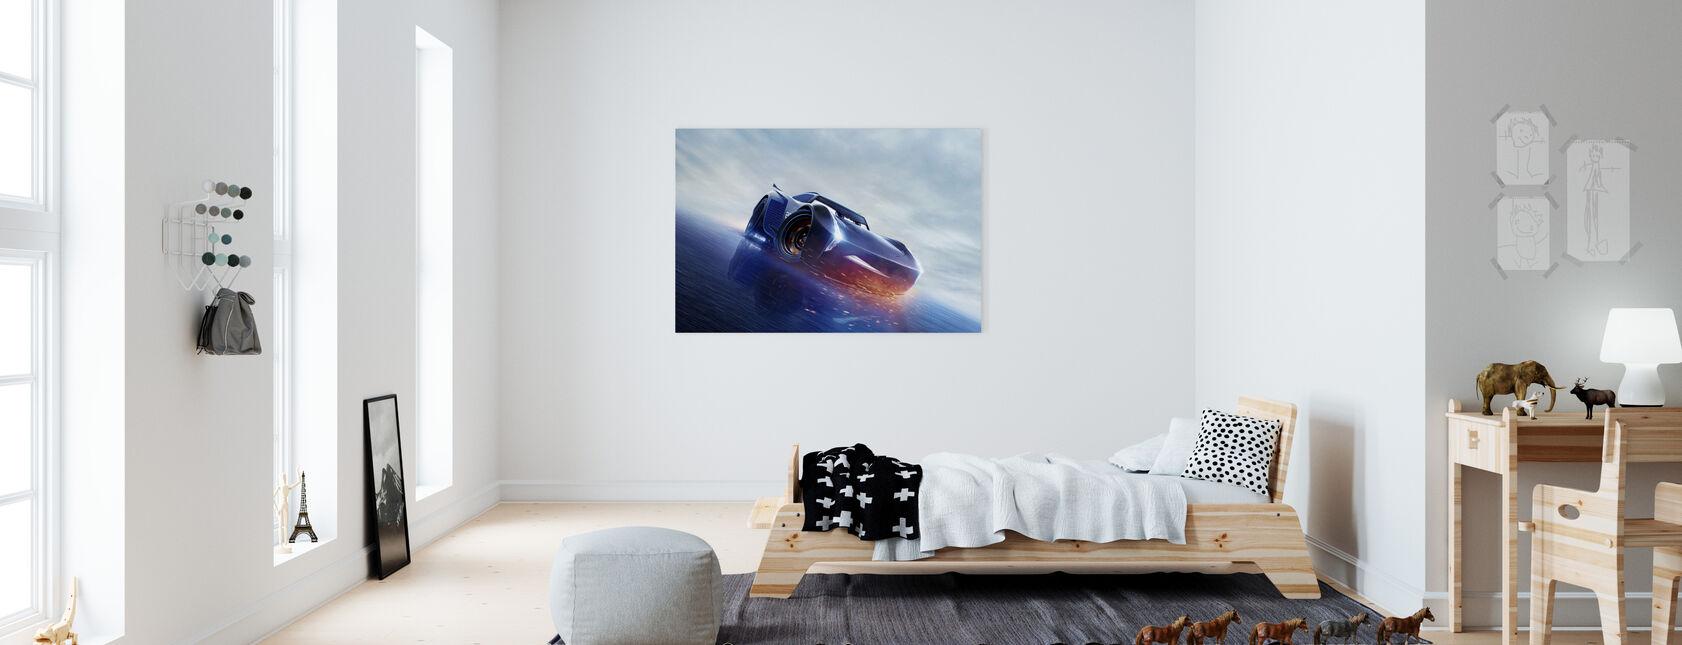 Disney - Cars – large canvas prints – Photowall